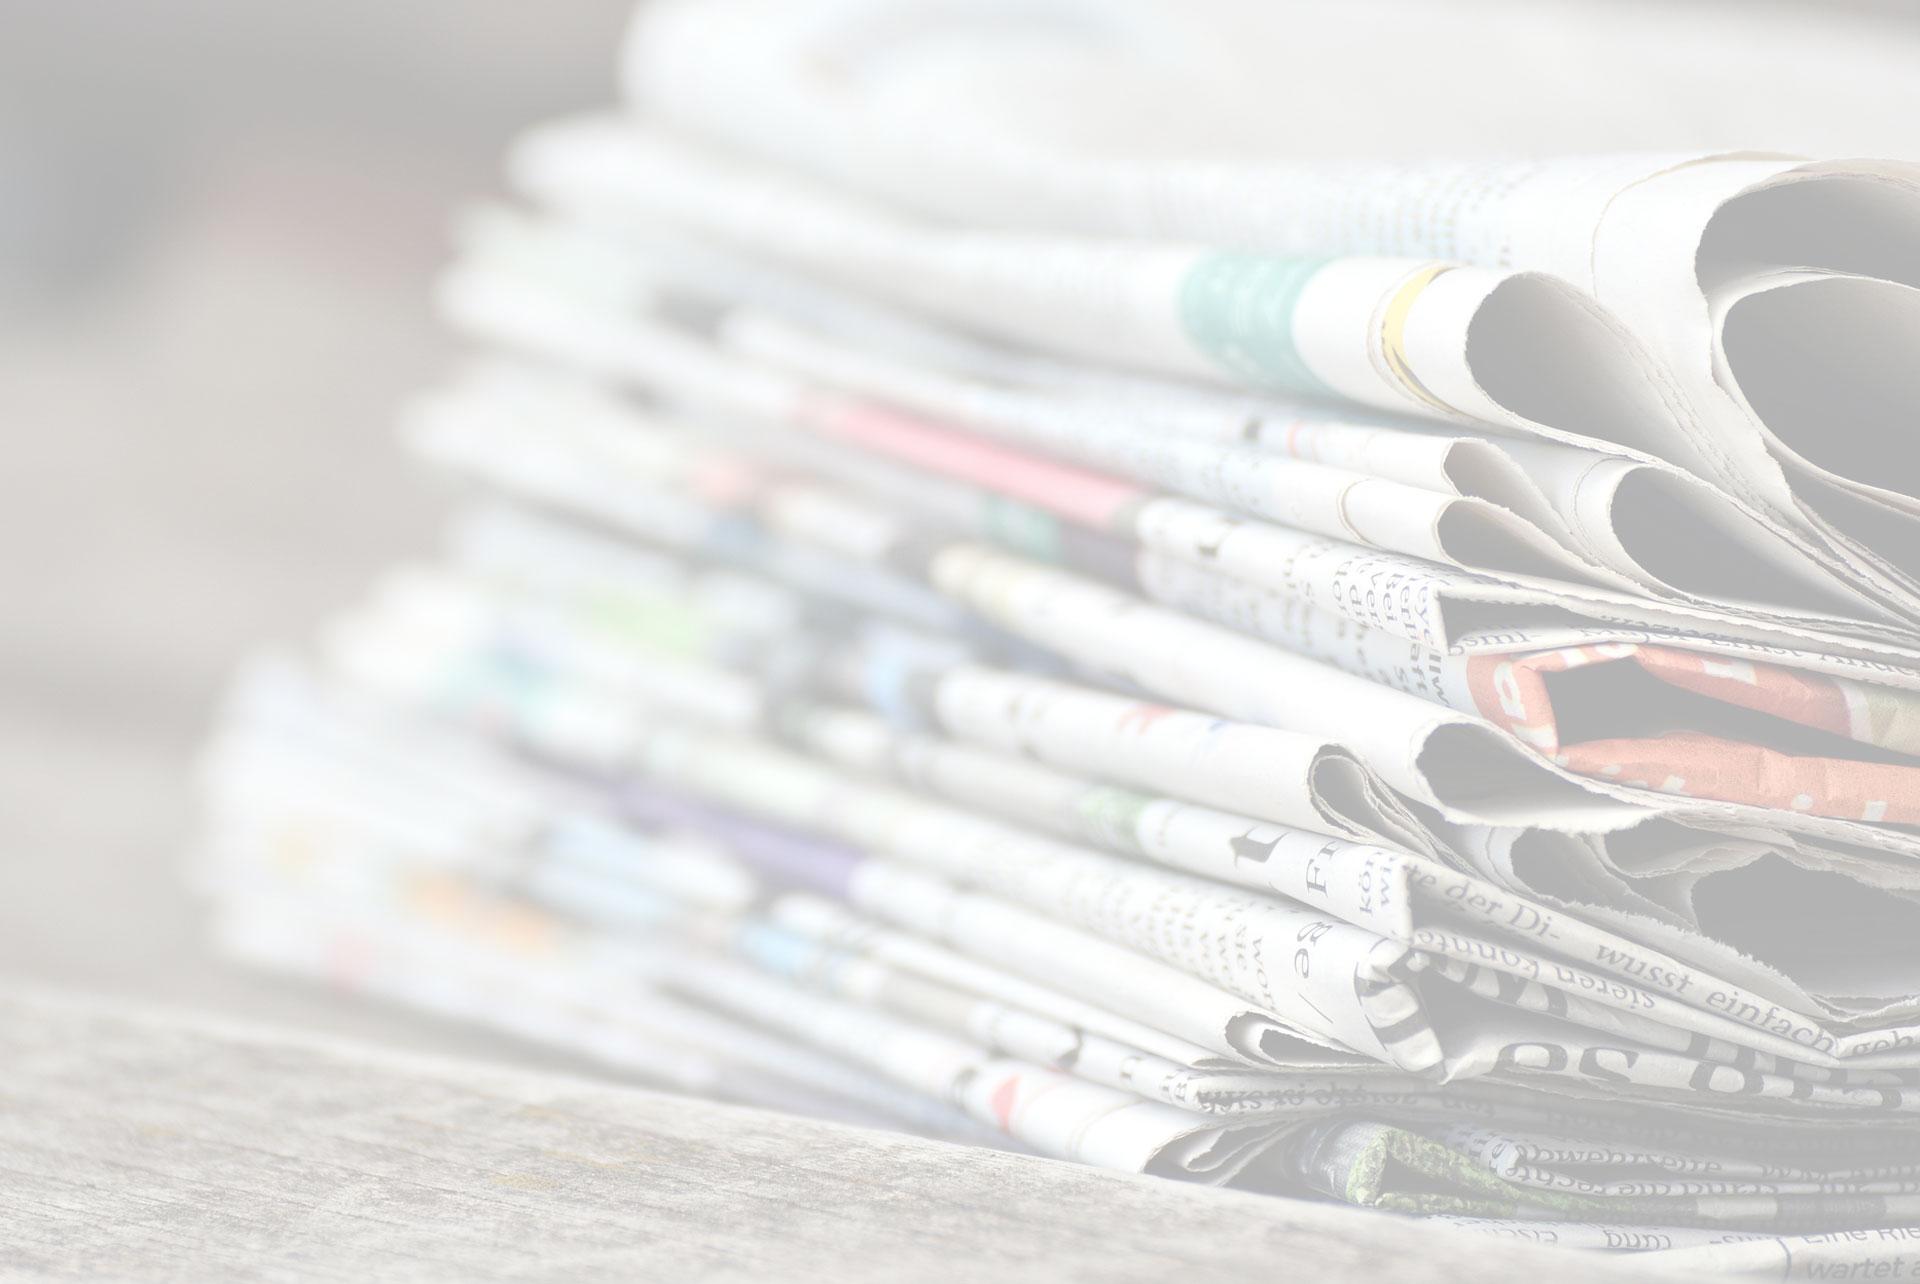 Mercedes Classe C vs Skoda Superb